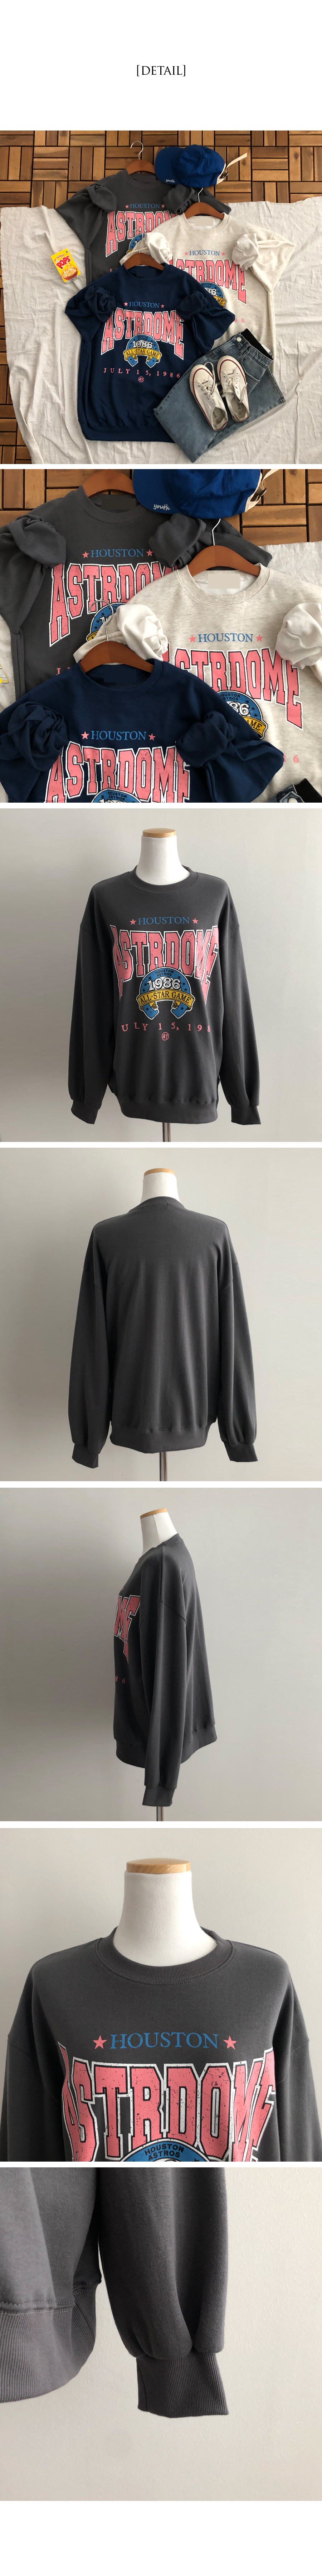 Houston Crack Rouge Sweatshirt